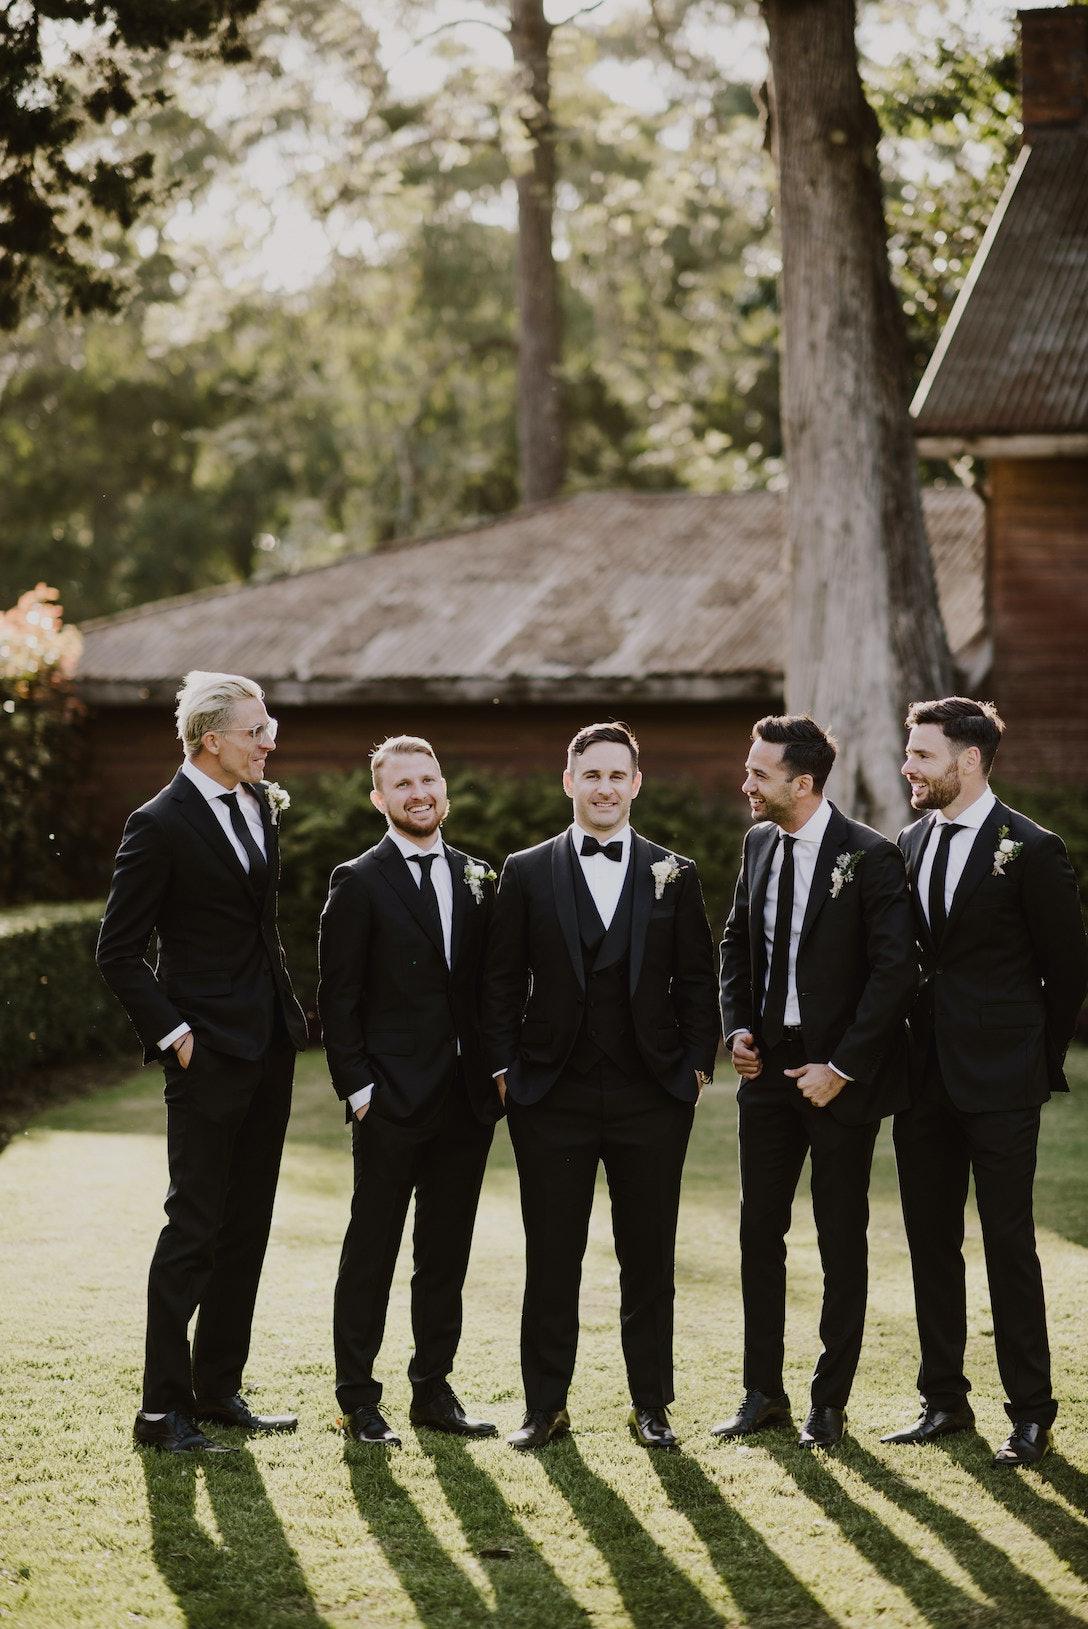 Groom and 4 groomsmen posing together